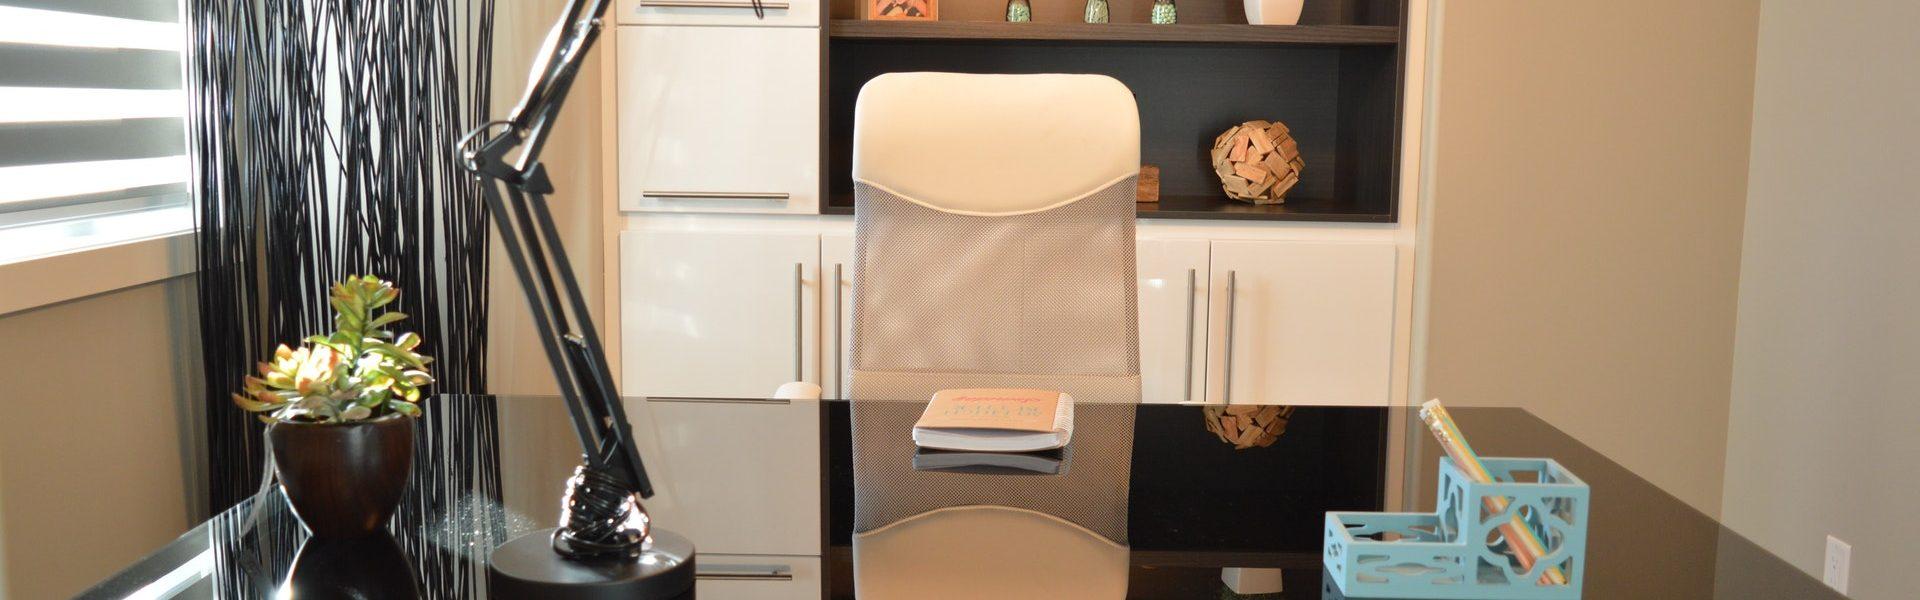 office-home-house-desk-159839